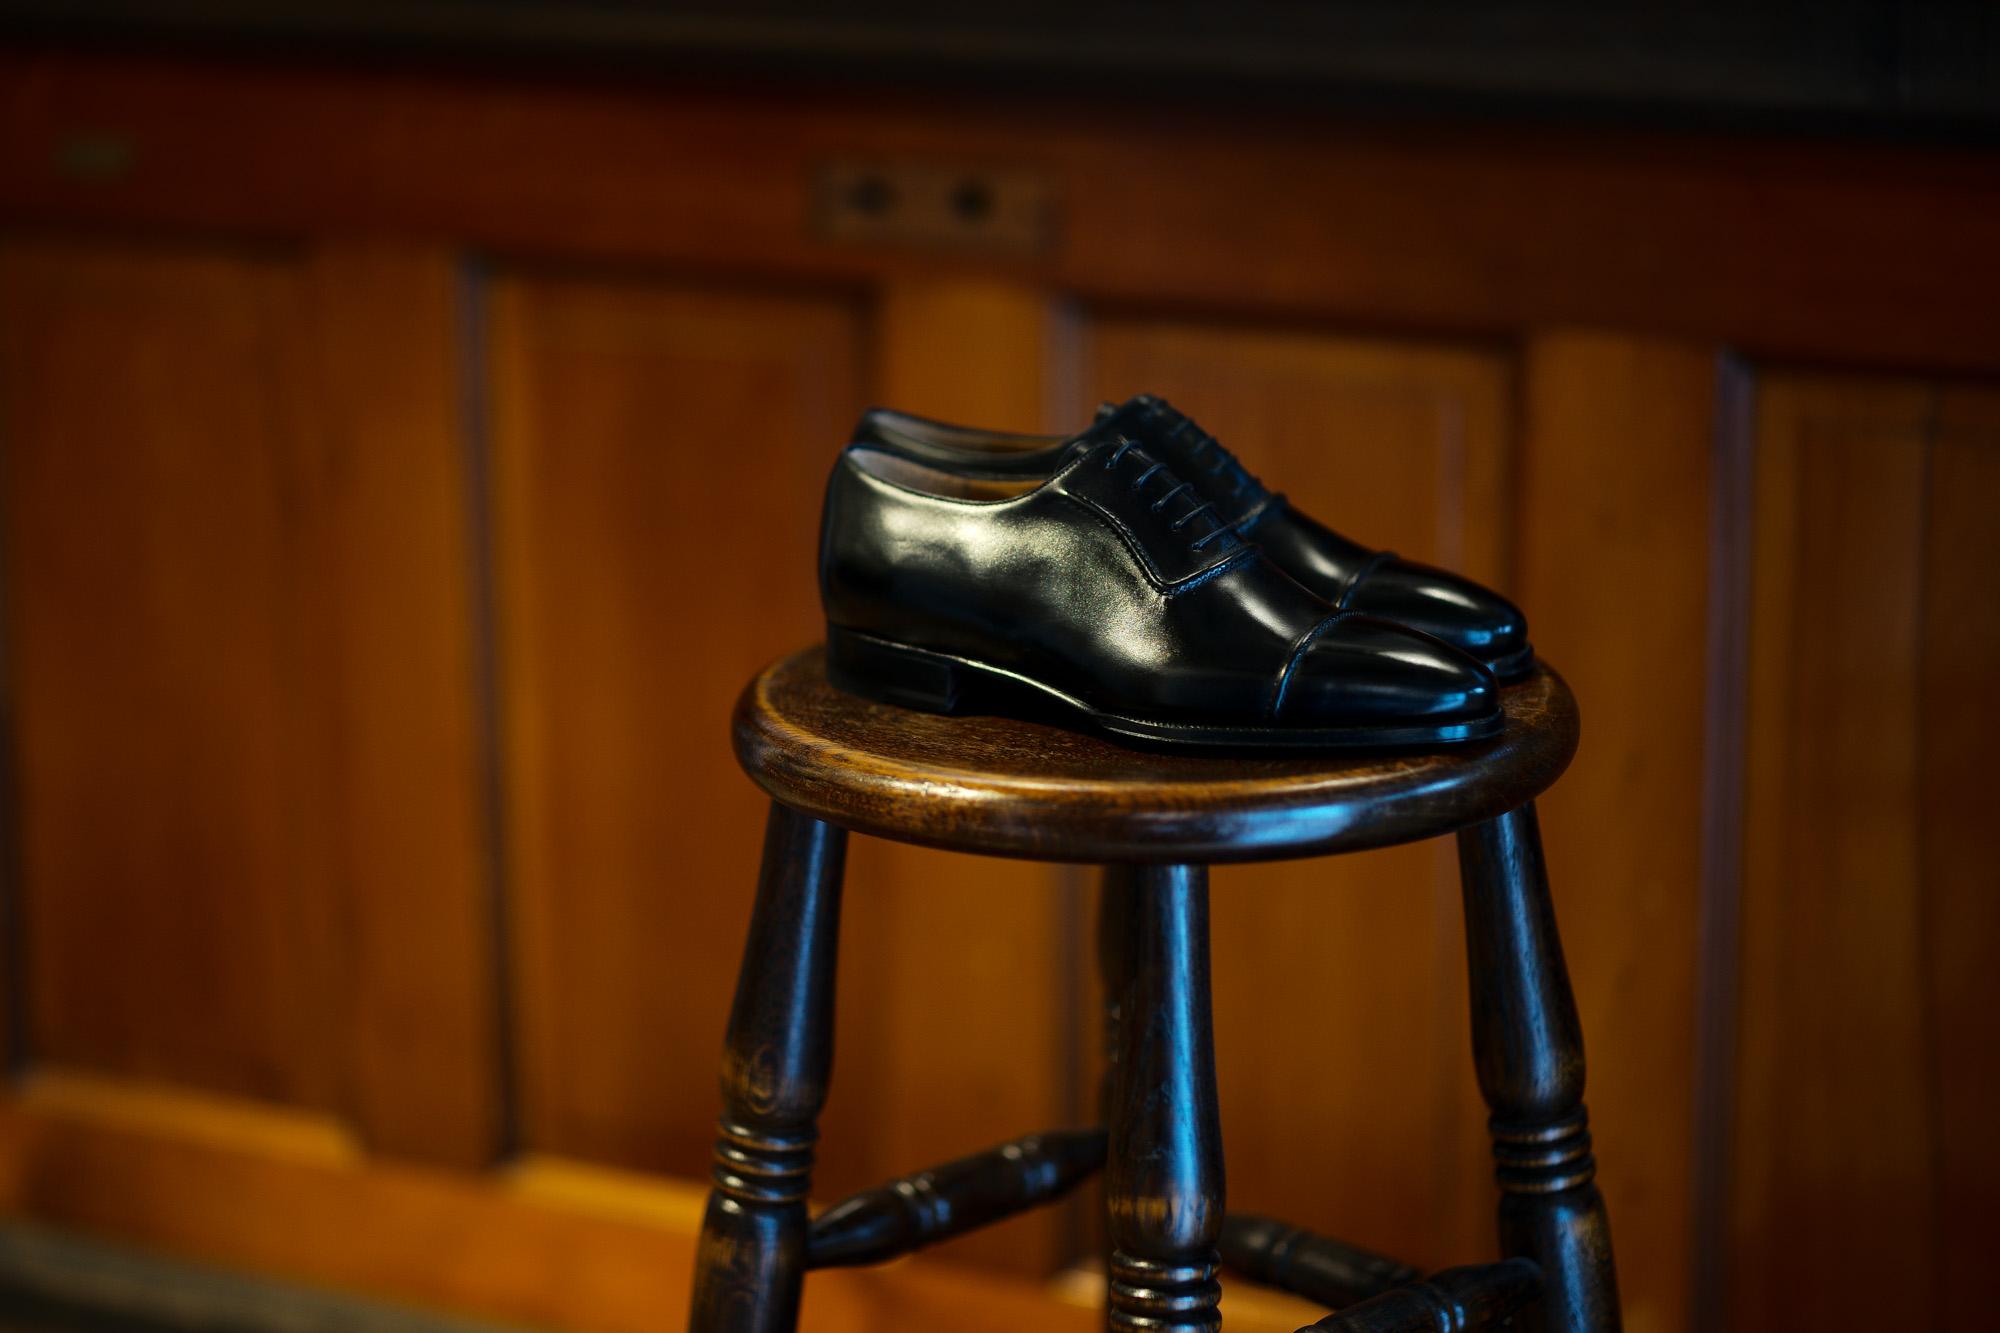 ENZO BONAFE (エンツォボナフェ) ART.3998 mod Straight Tip Shoes Du Puy Vitello デュプイ社ボックスカーフ ストレートチップシューズ NERO (ブラック) made in italy (イタリア製) 2020 春夏新作 【Special Model】【Alto e Diritto 別注】